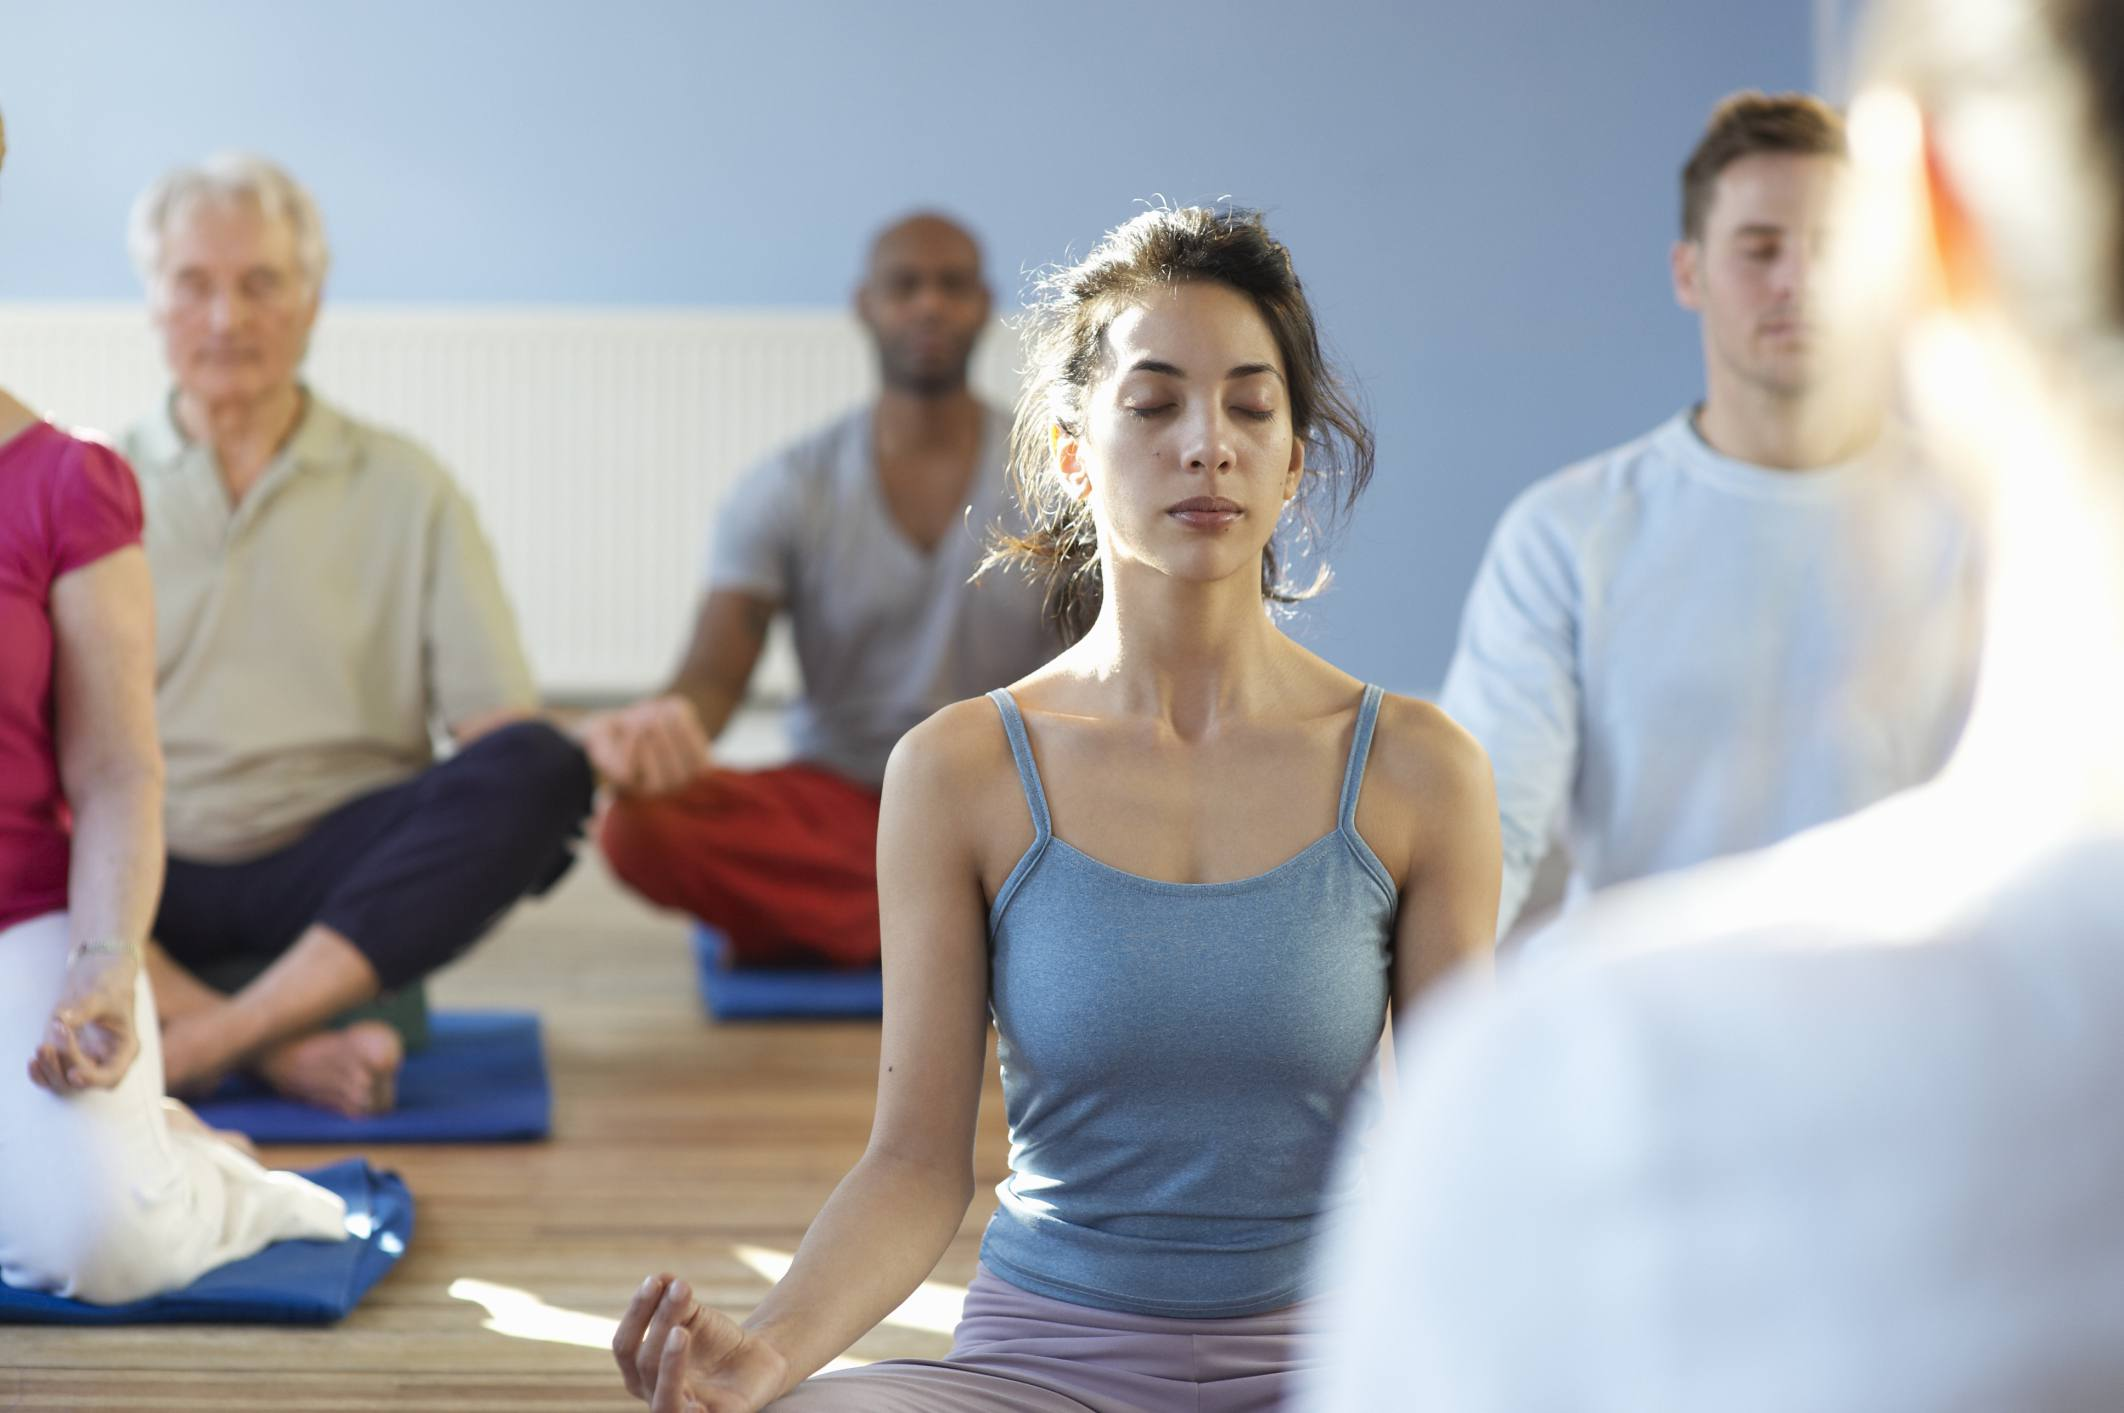 yoga-class-meditation-relax-Dougal-Waters.jpg